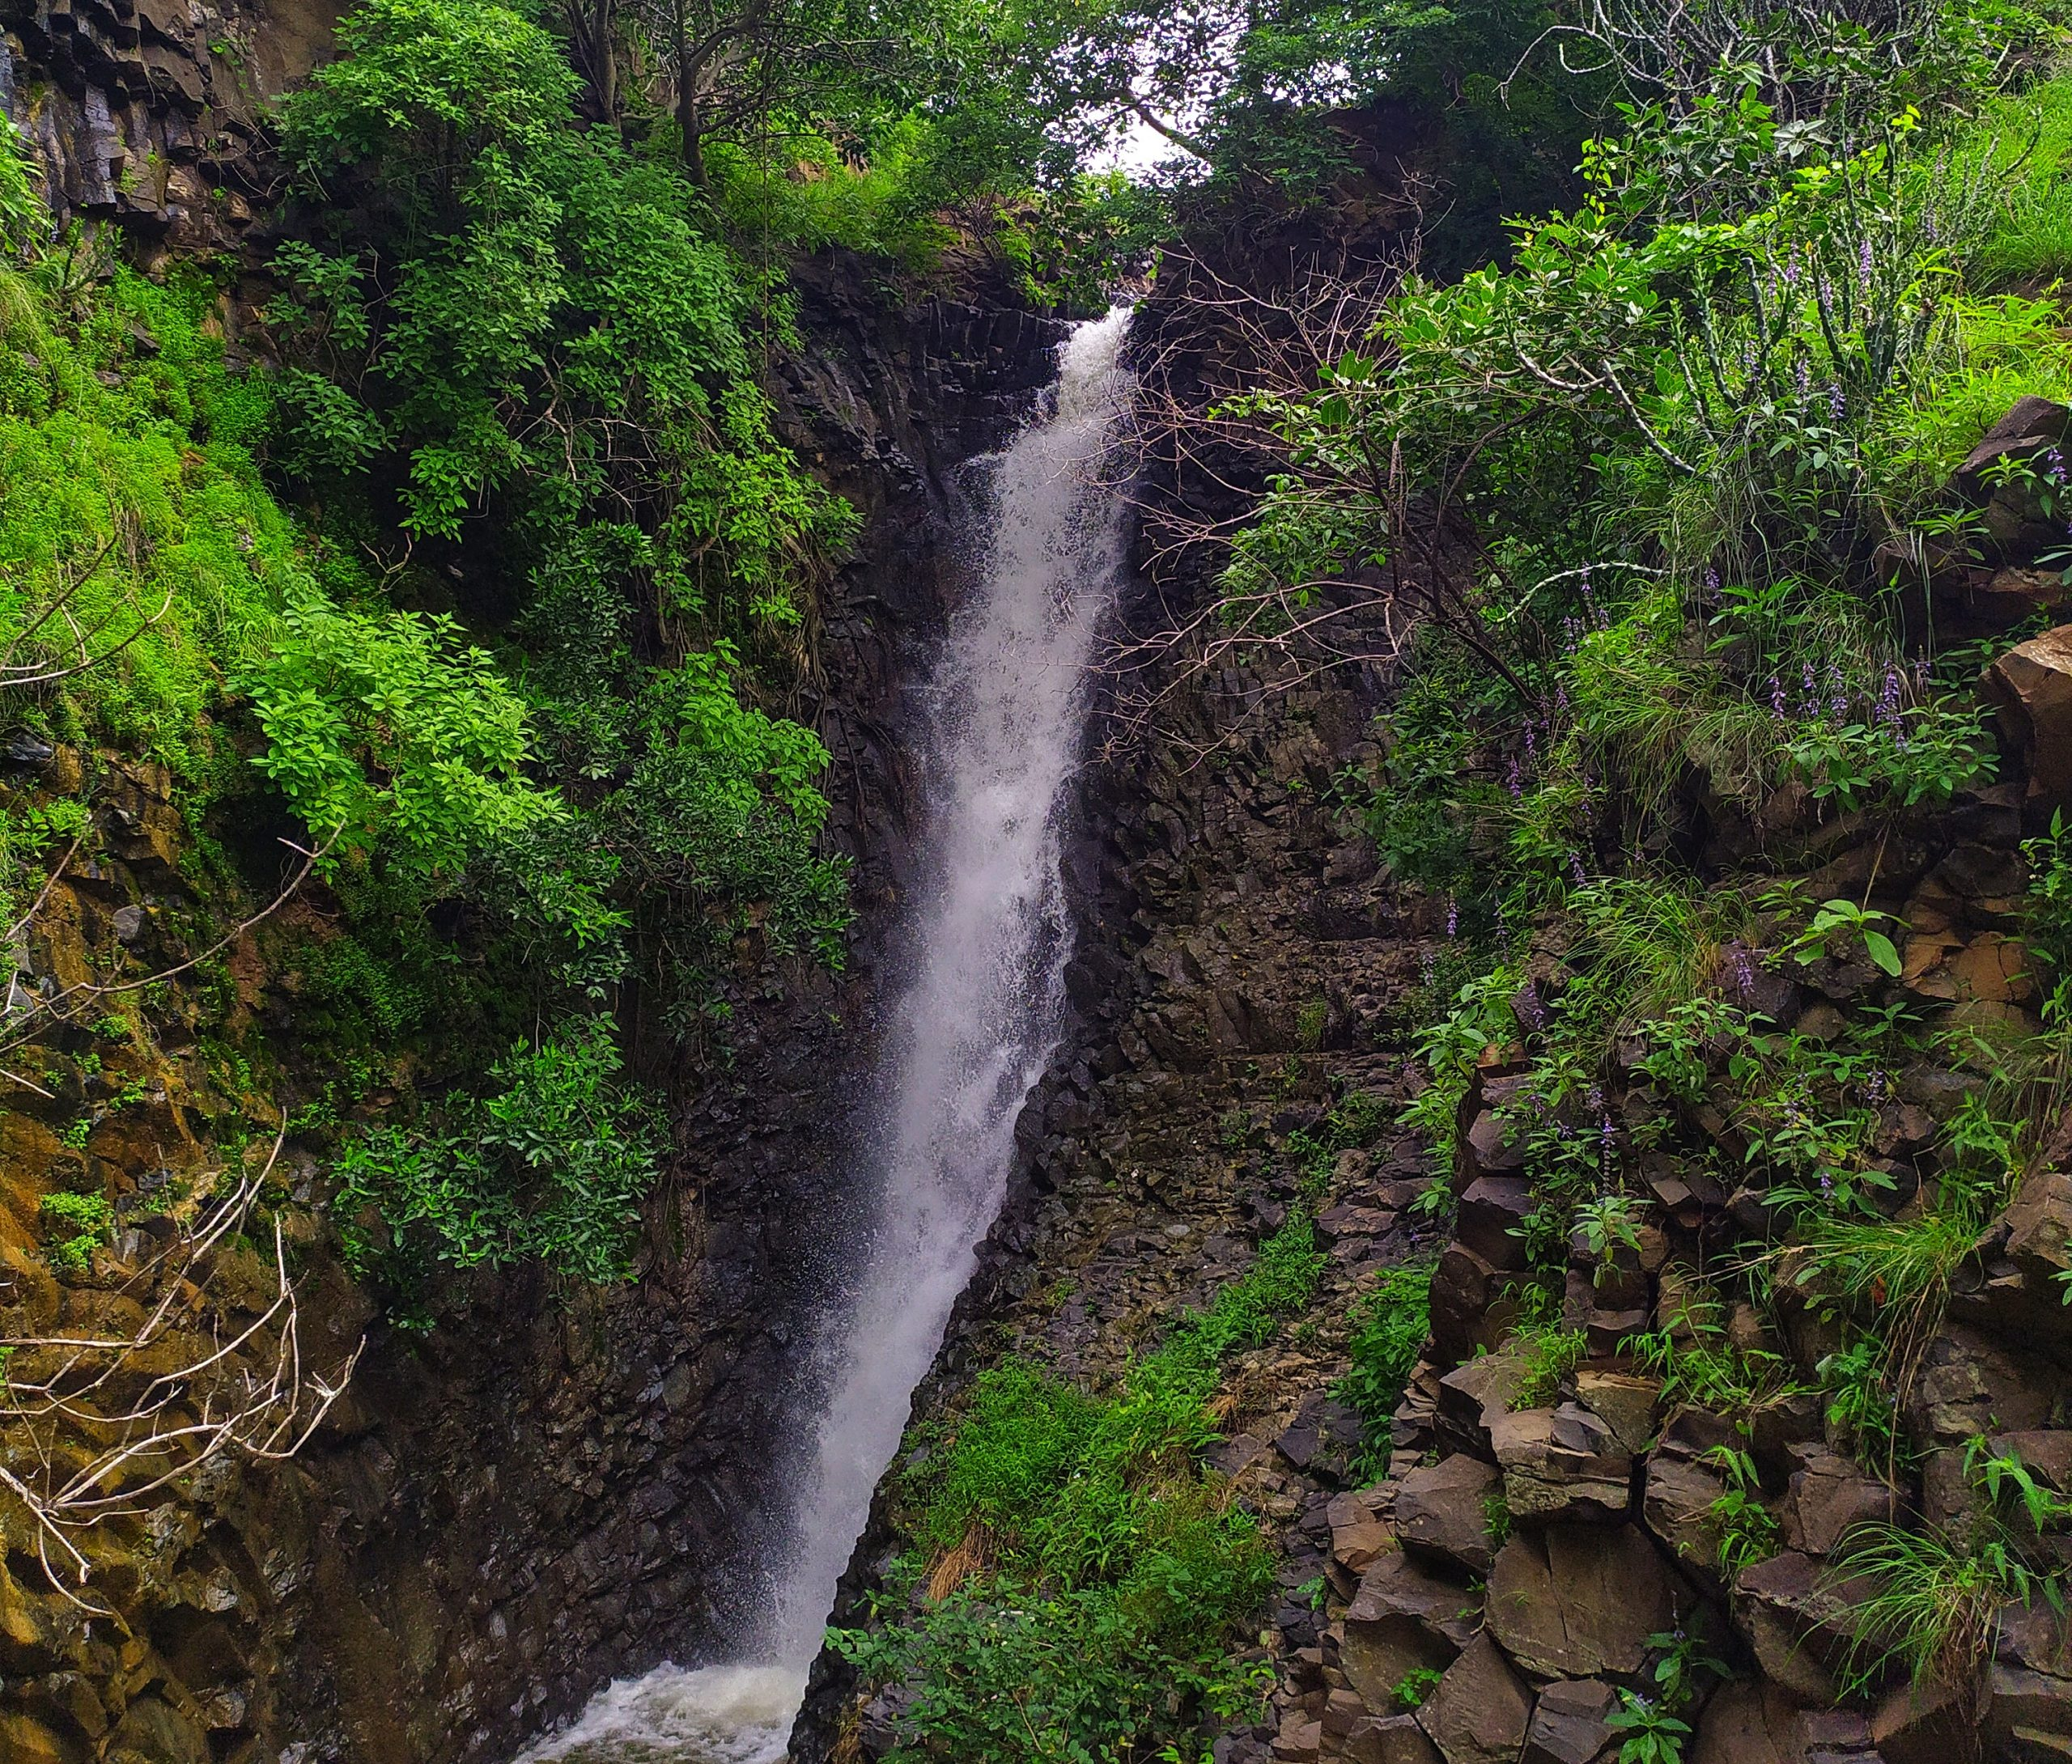 A narrow waterfall in a jungle